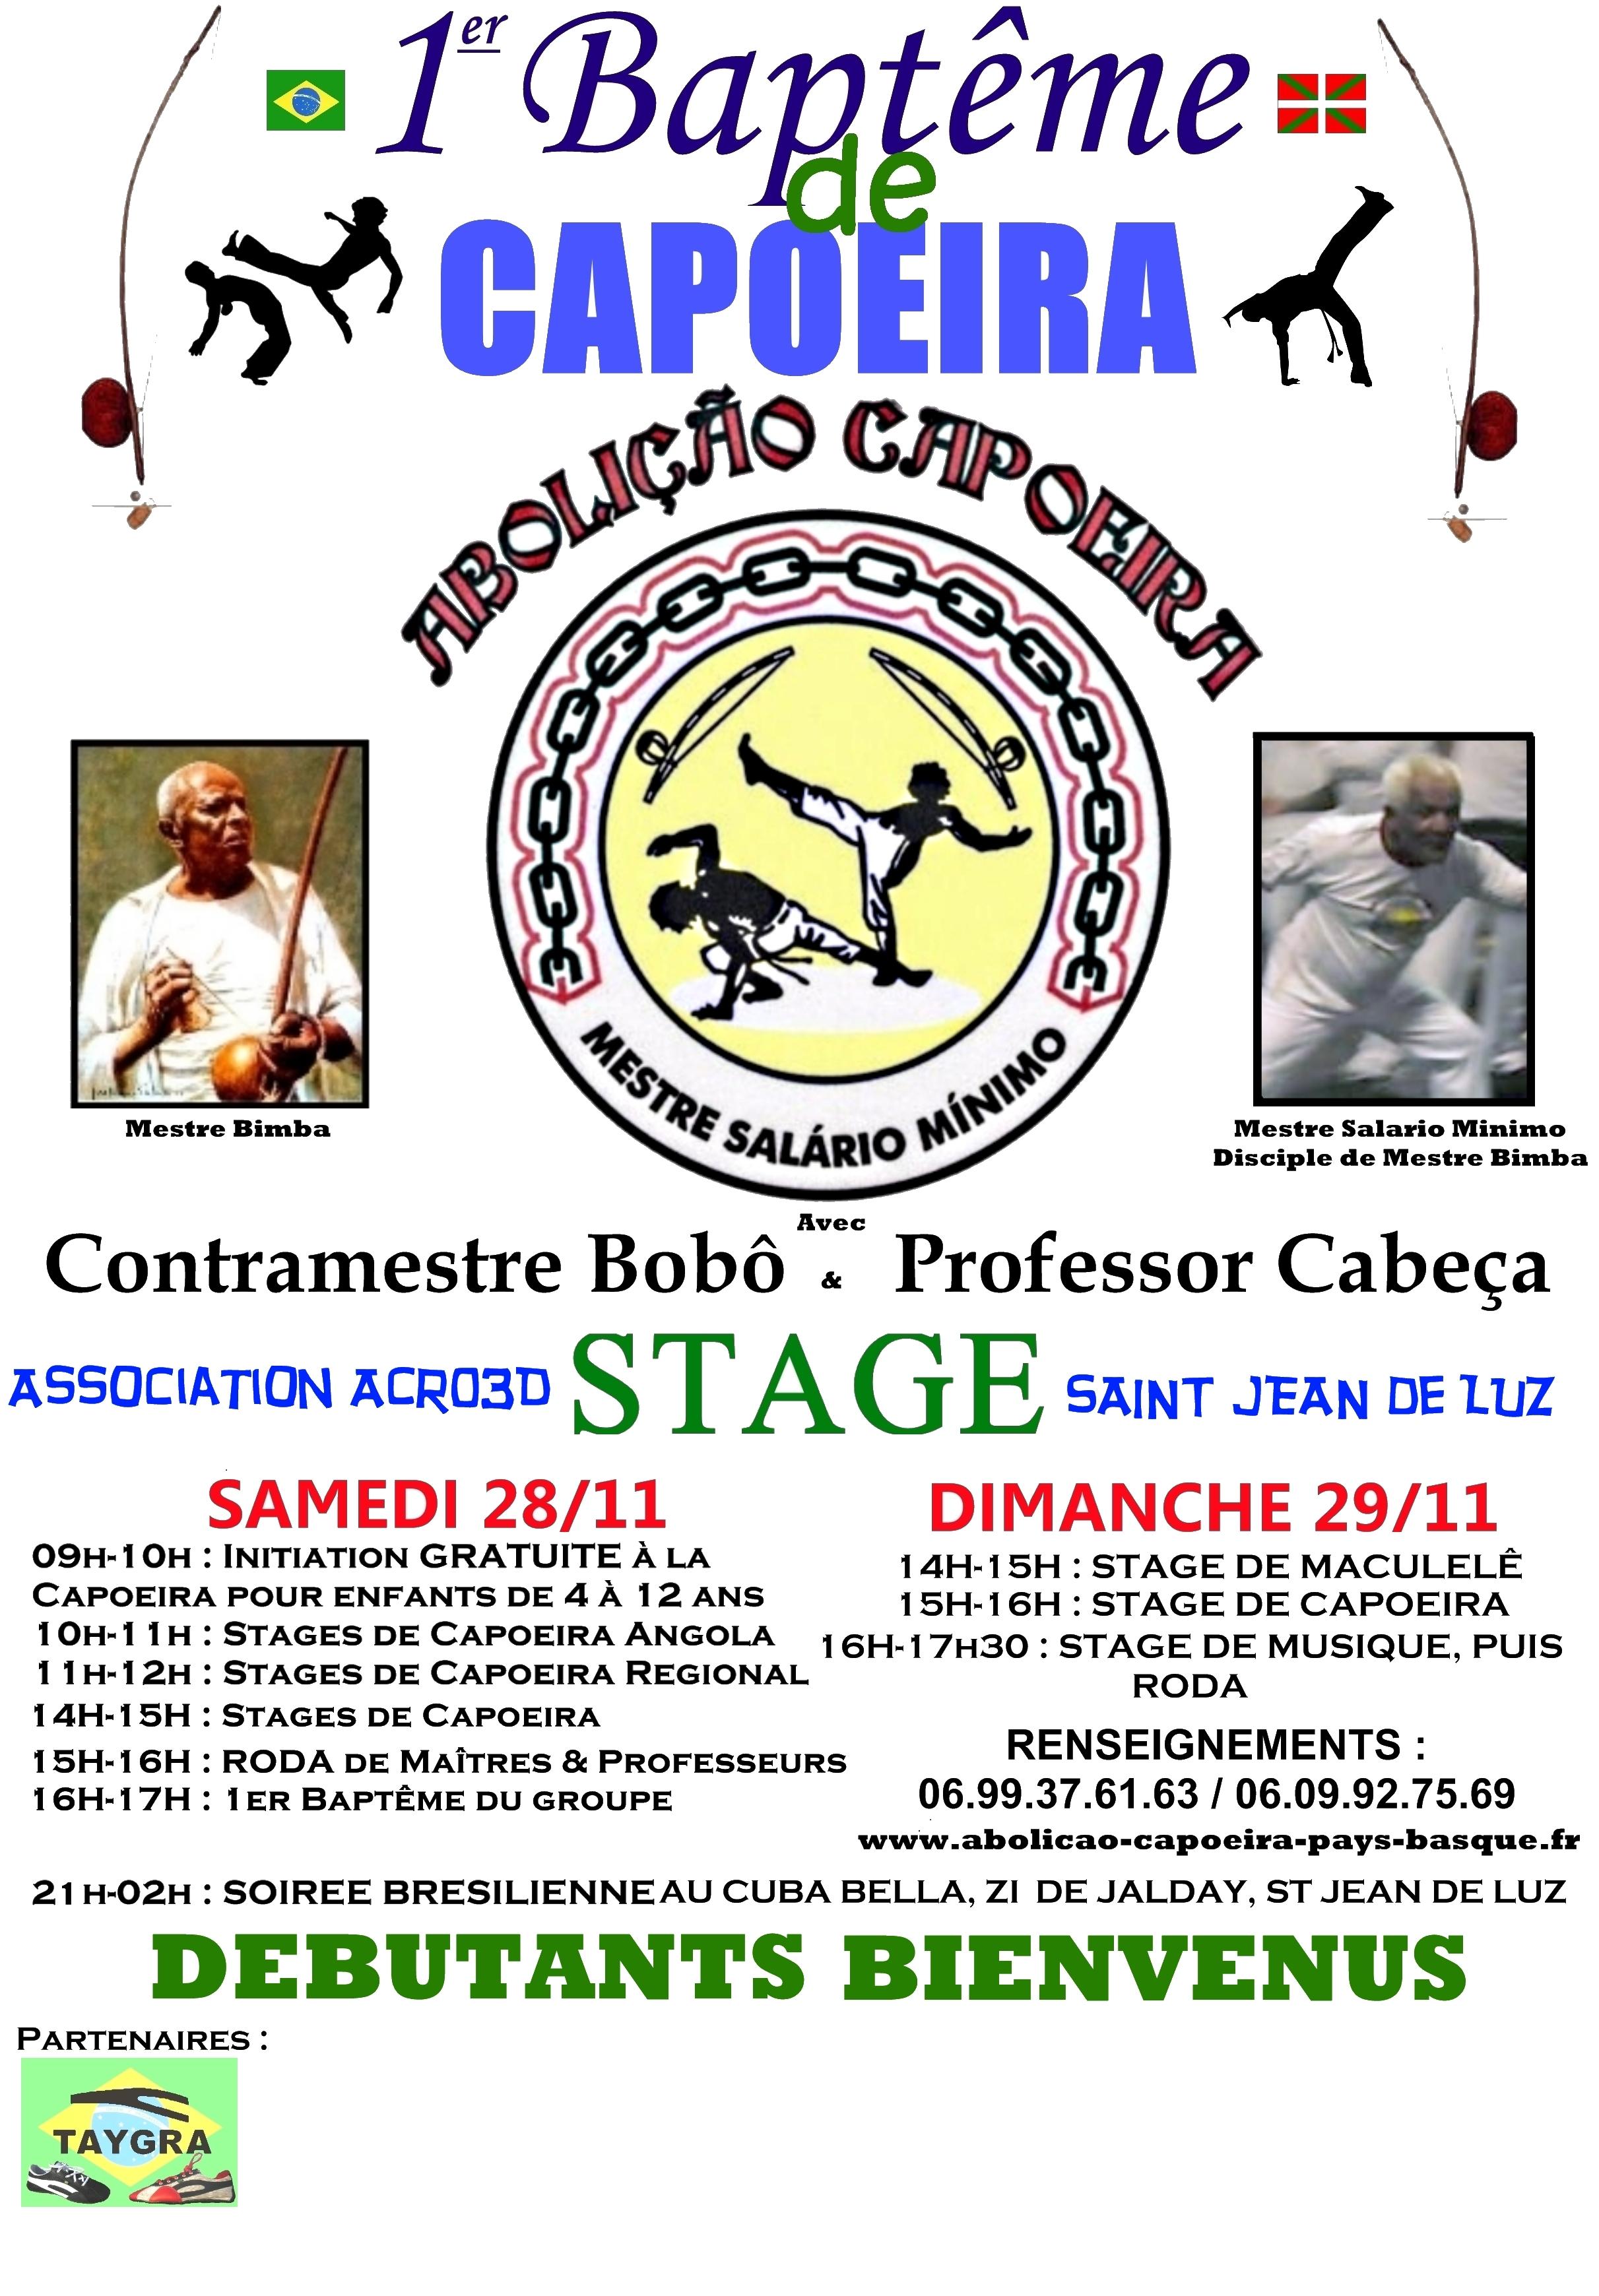 SPONSOR TAYGRA christening internship CAPOEIRA November 28-29 to HOLY JEAN OF LUZ Brazilian party in Cuba Bella